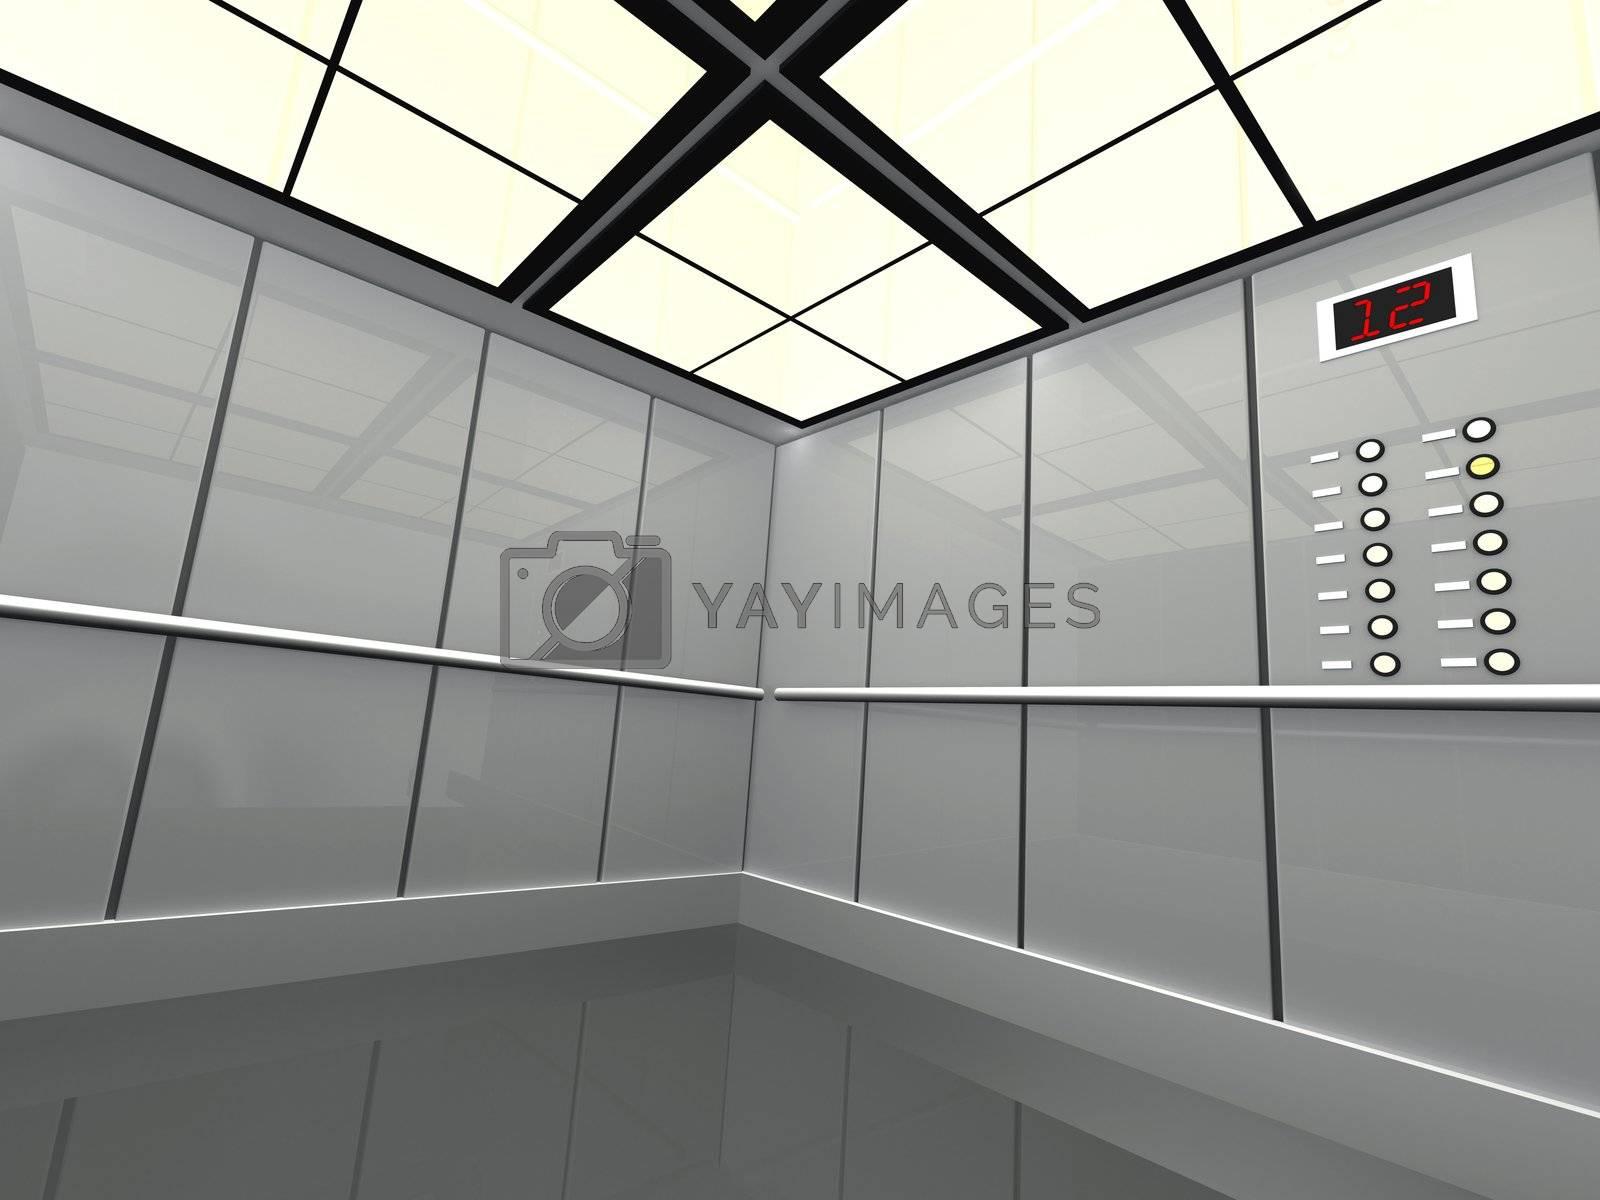 Computer generated image - Large elevator .